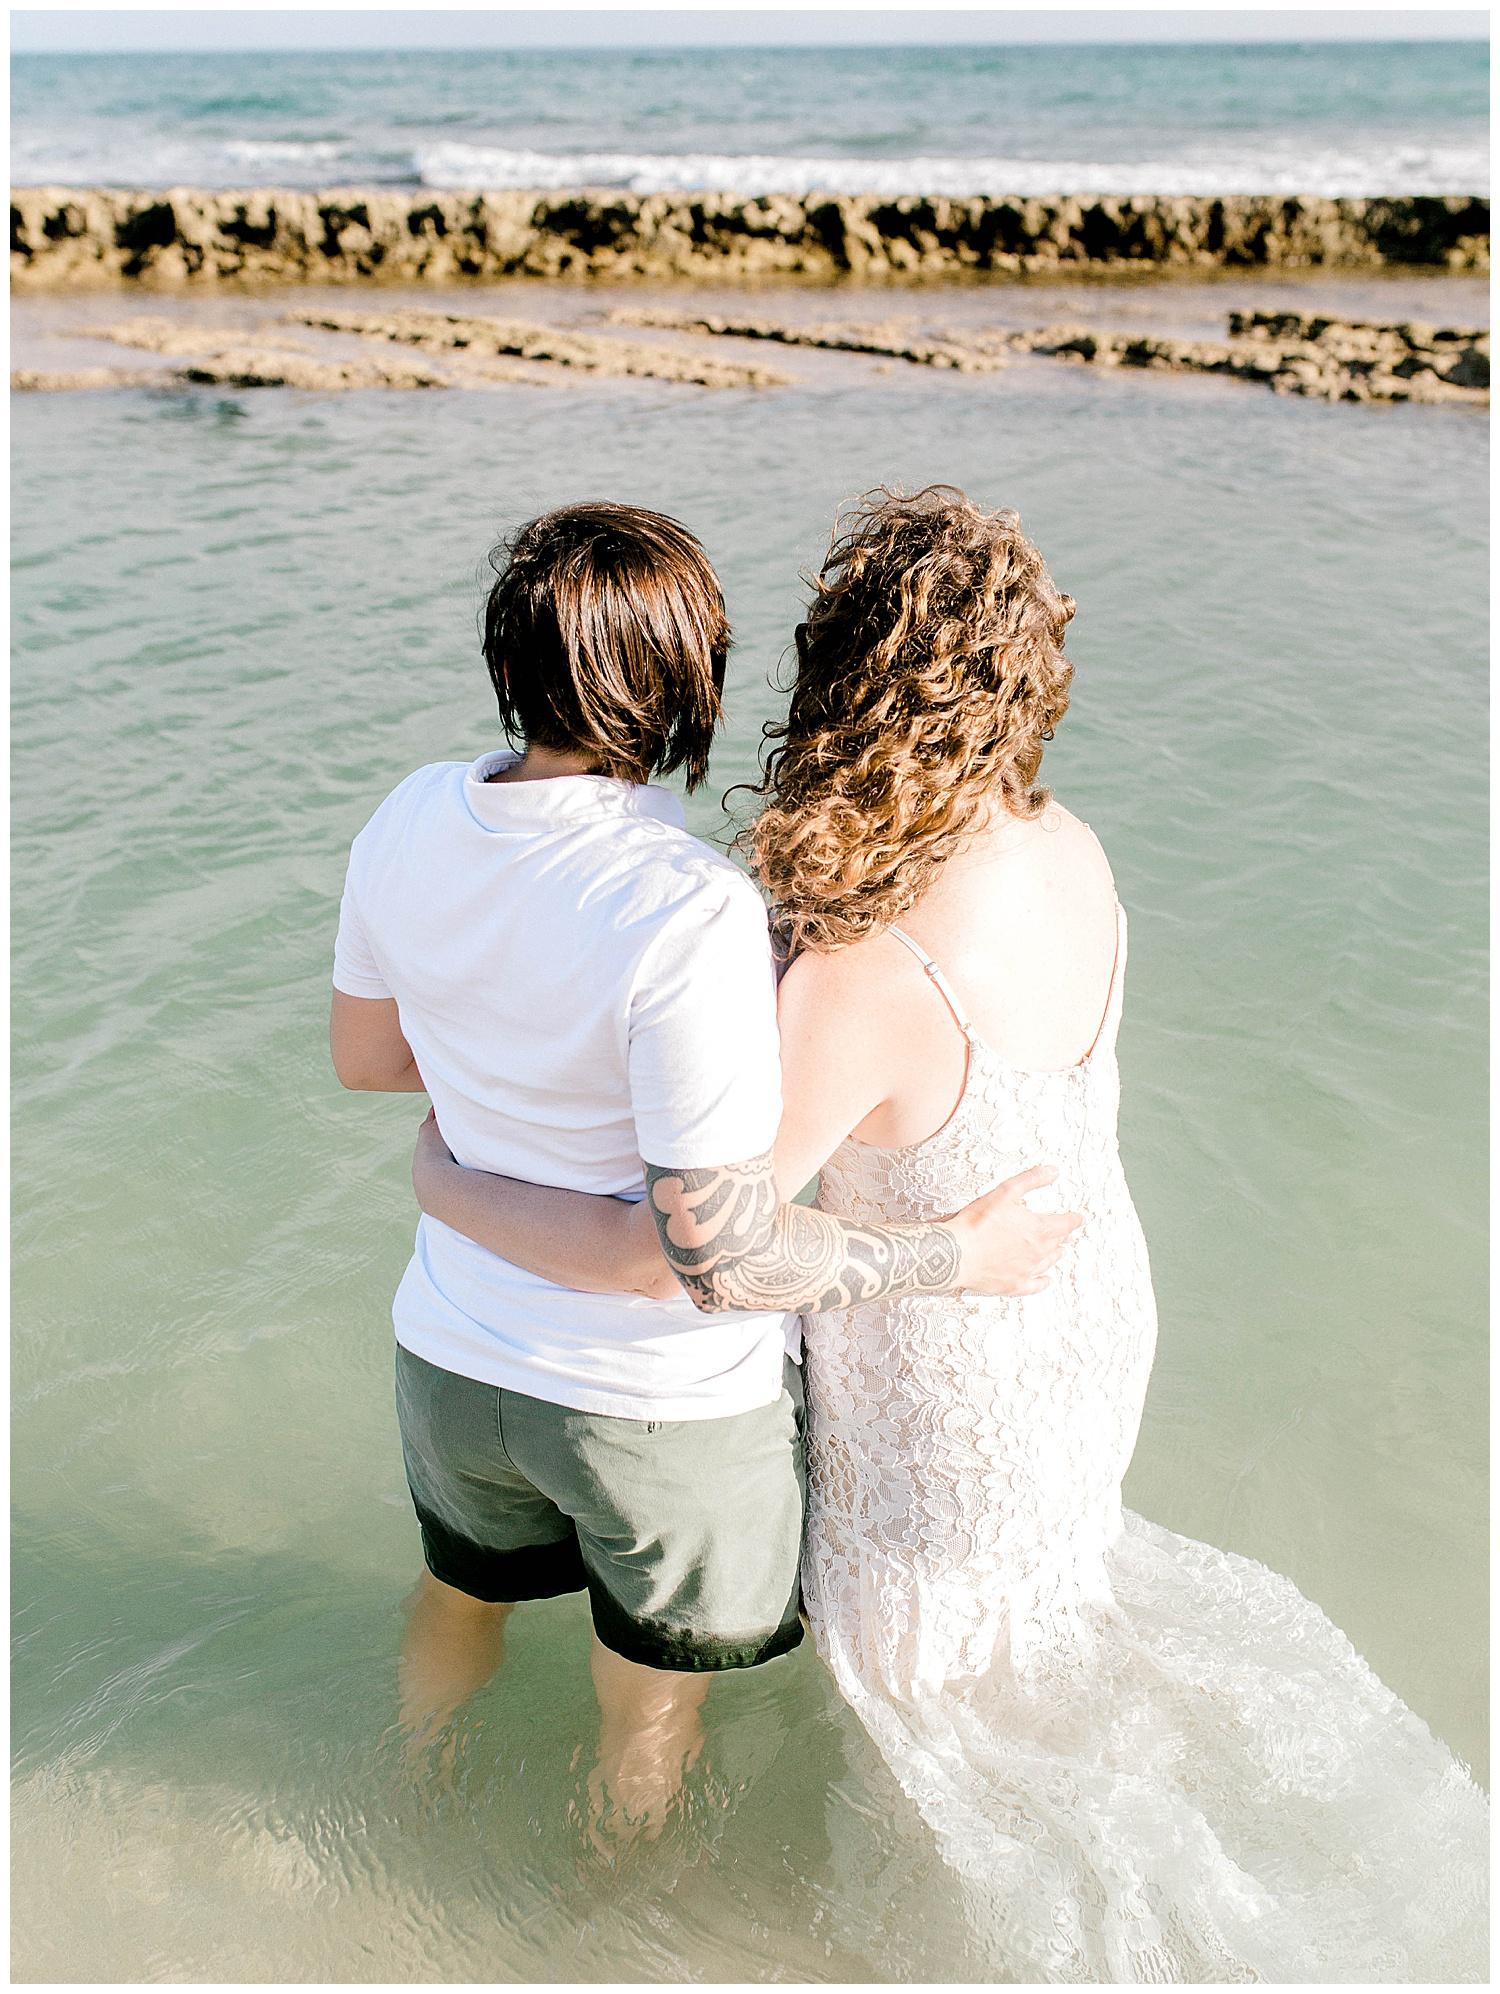 Honeymoon-Photo-Session-Maui-North-Shore_0039.jpg